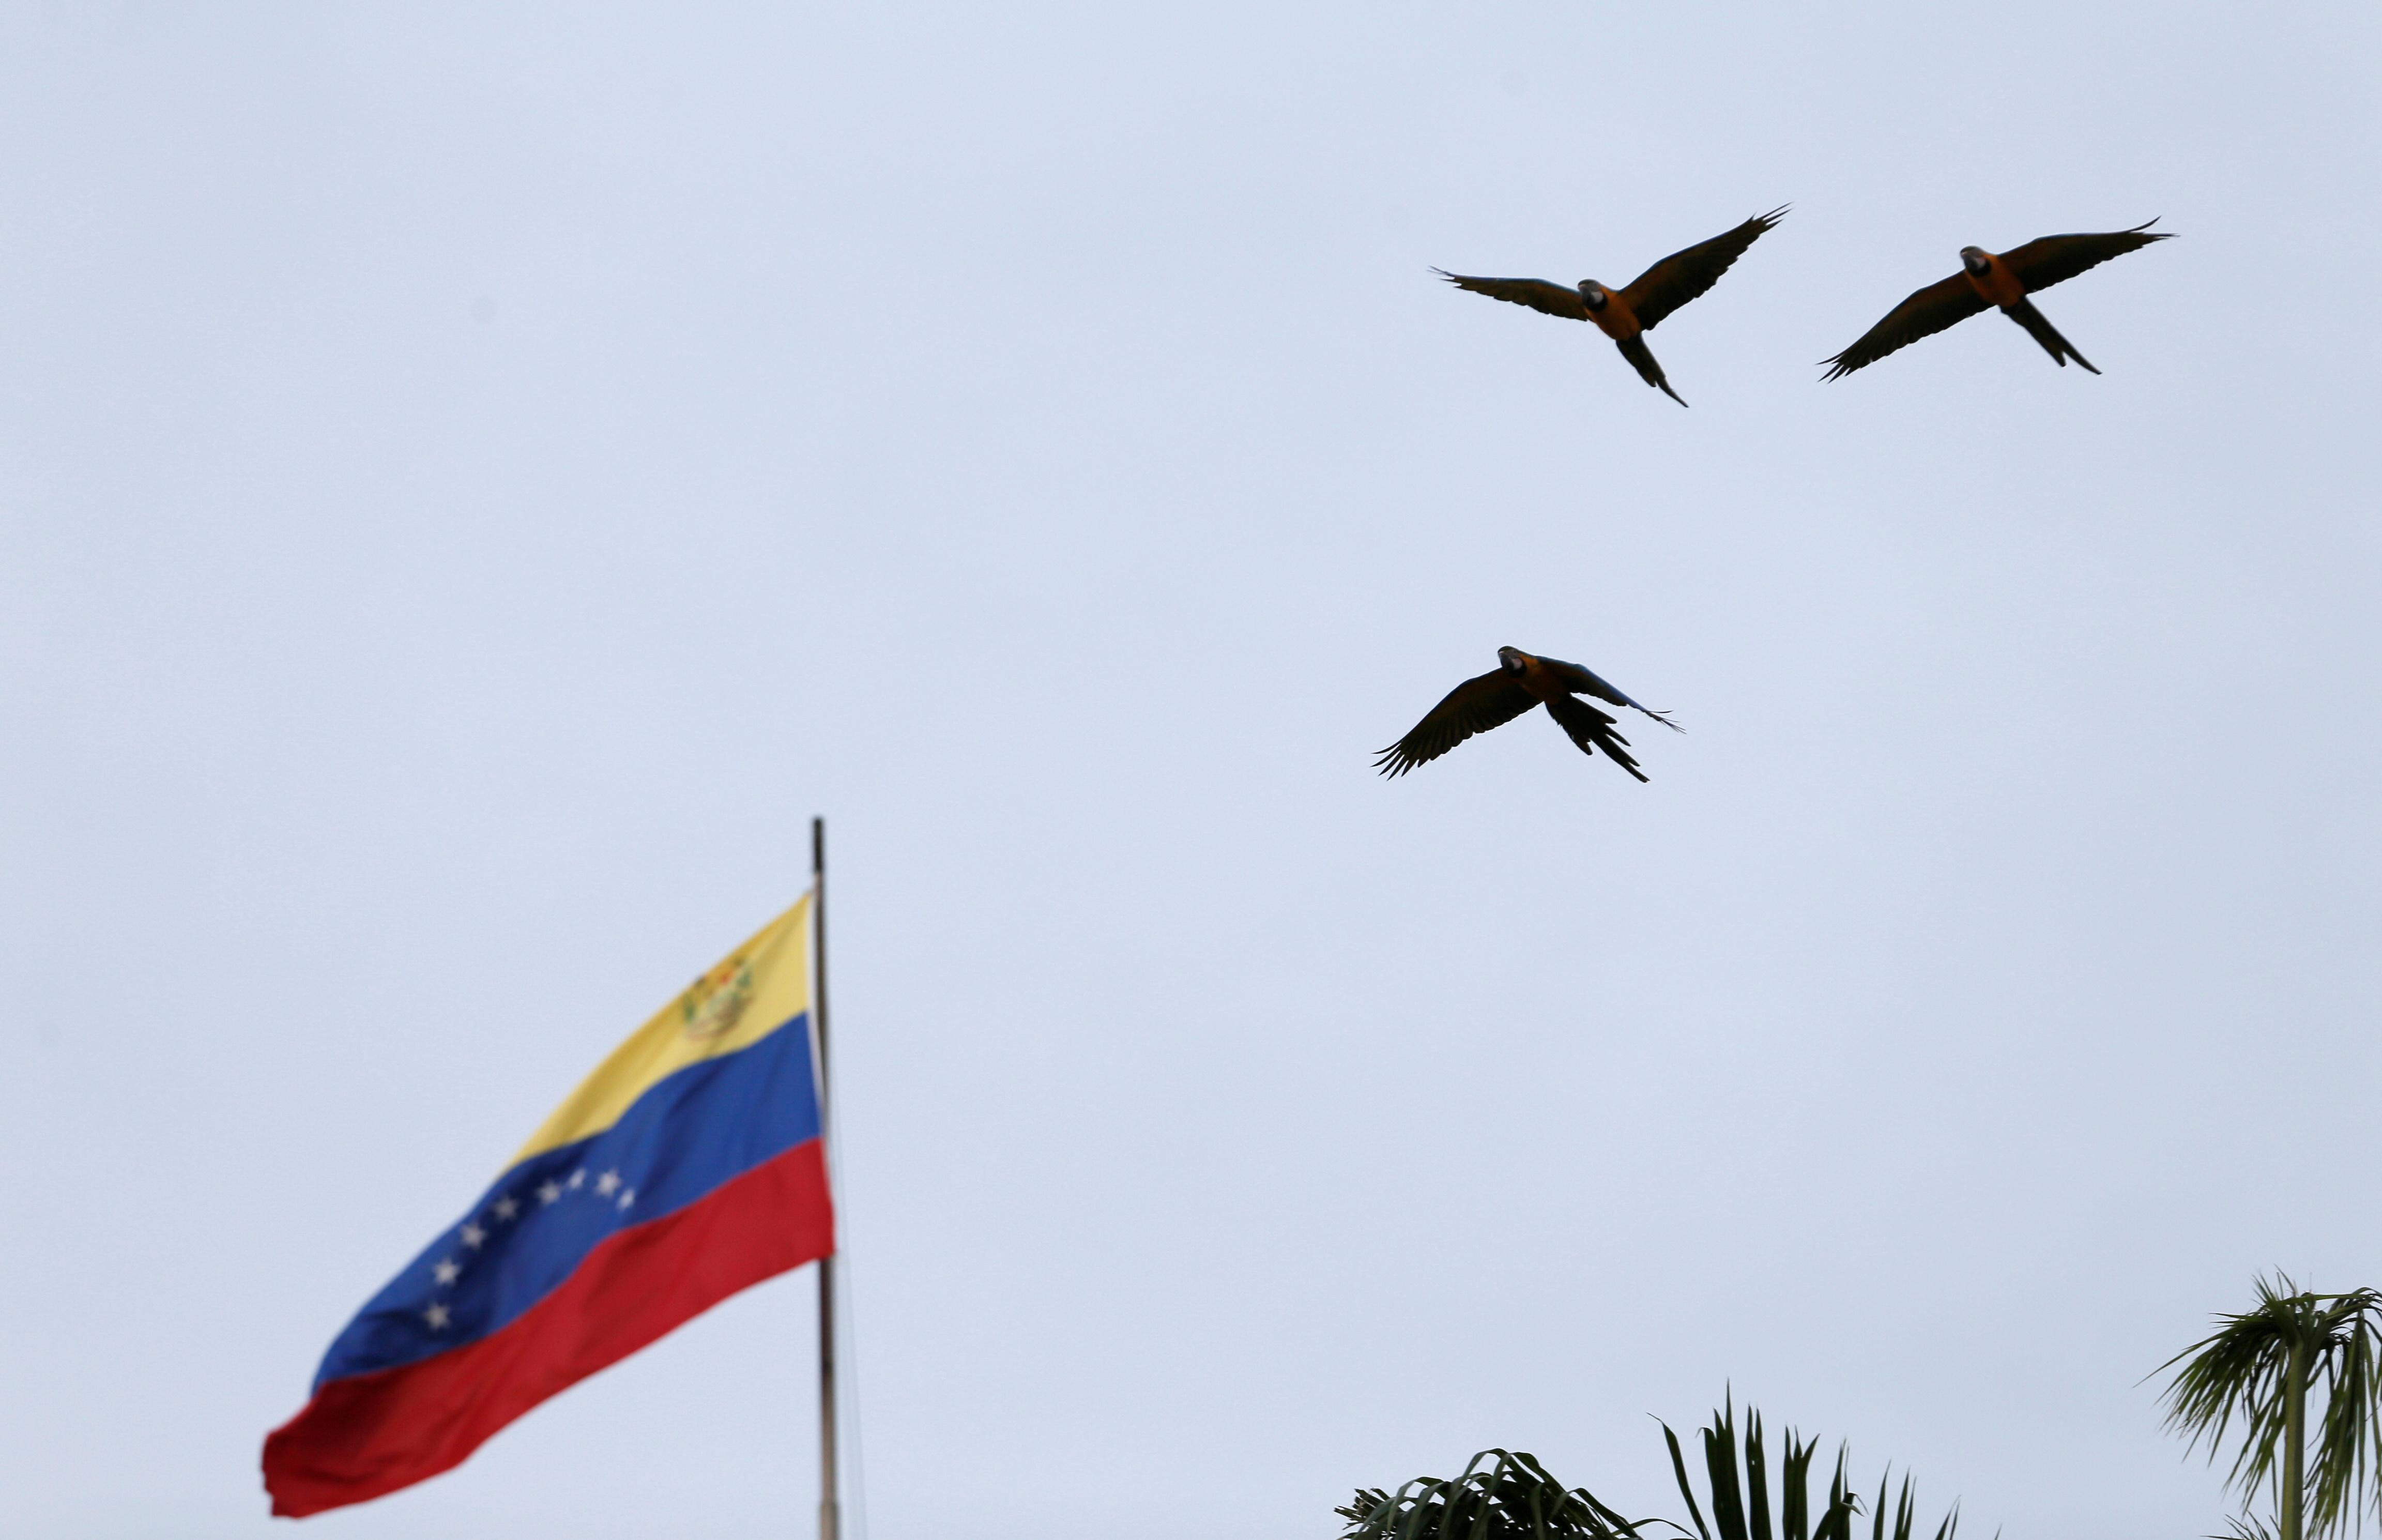 Birds fly next to a Venezuelan flag in Caracas, Venezuela January 12, 2021. REUTERS/Manaure Quintero/File Photo